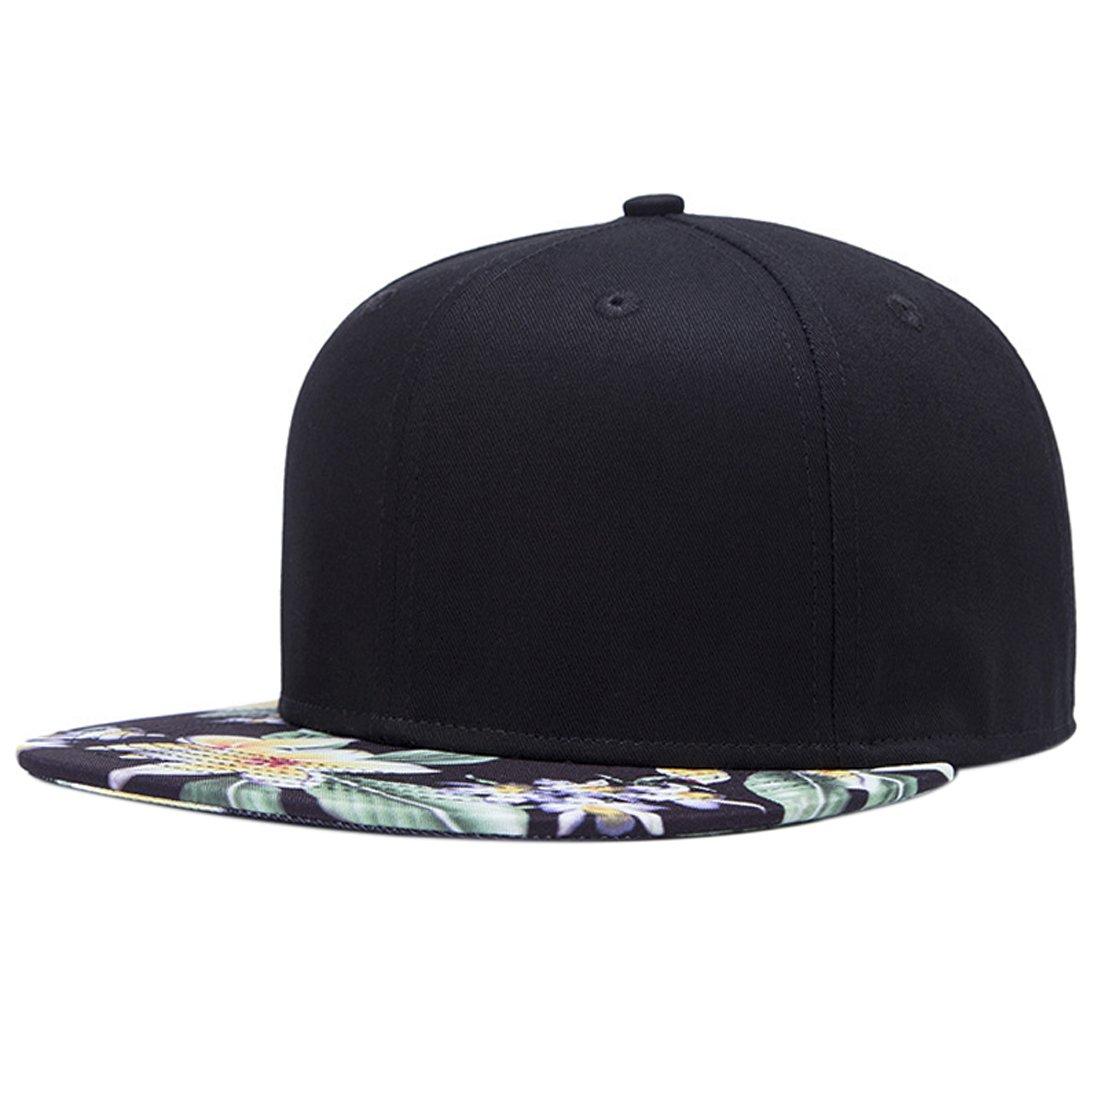 ChezAbbey Solid Flat Brim Hip Hop Adjustable Hat Stylish Snapback Baseball Cap